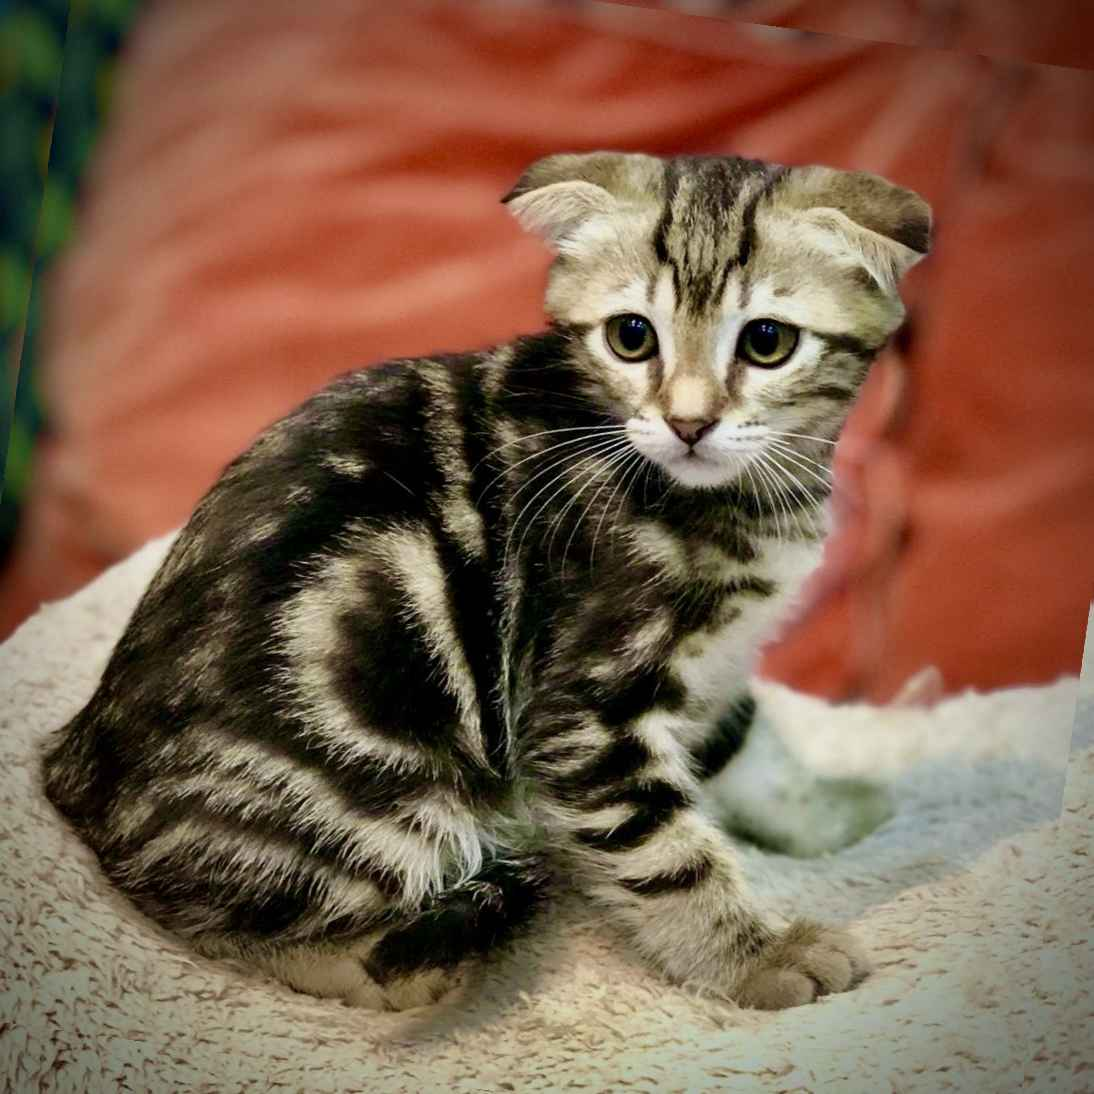 scottish fold kittens for sale in abu dhabi uae